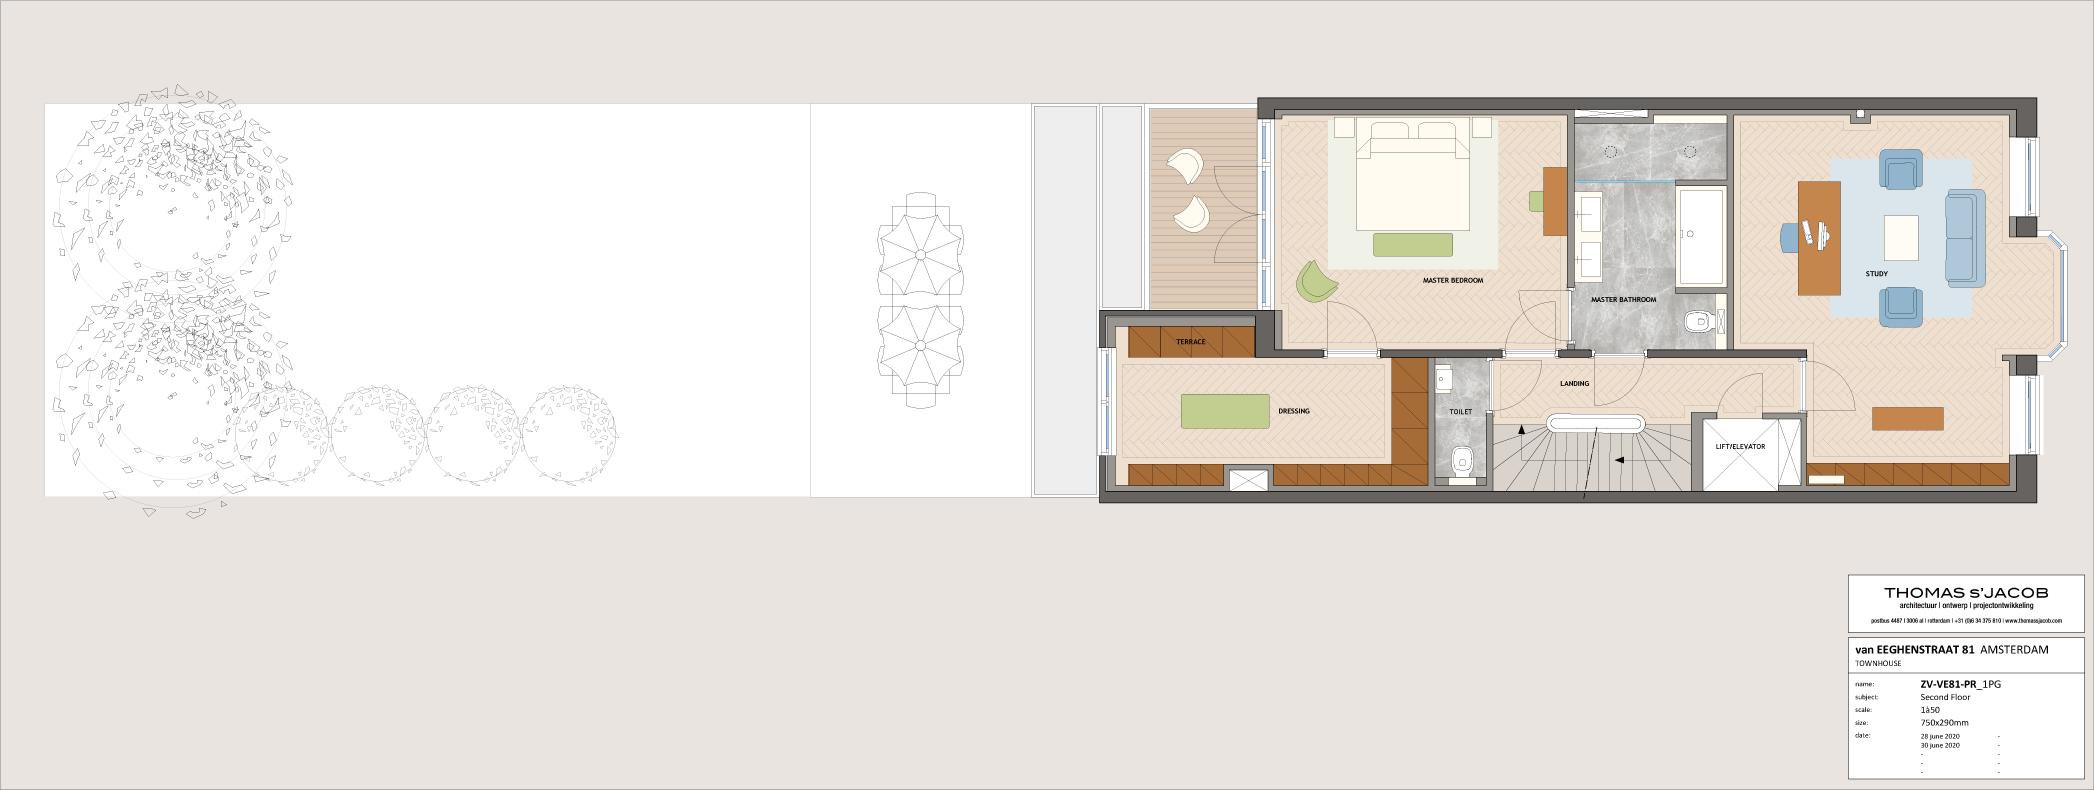 plattegrond van eeghenstraat 81,  2e verdieping